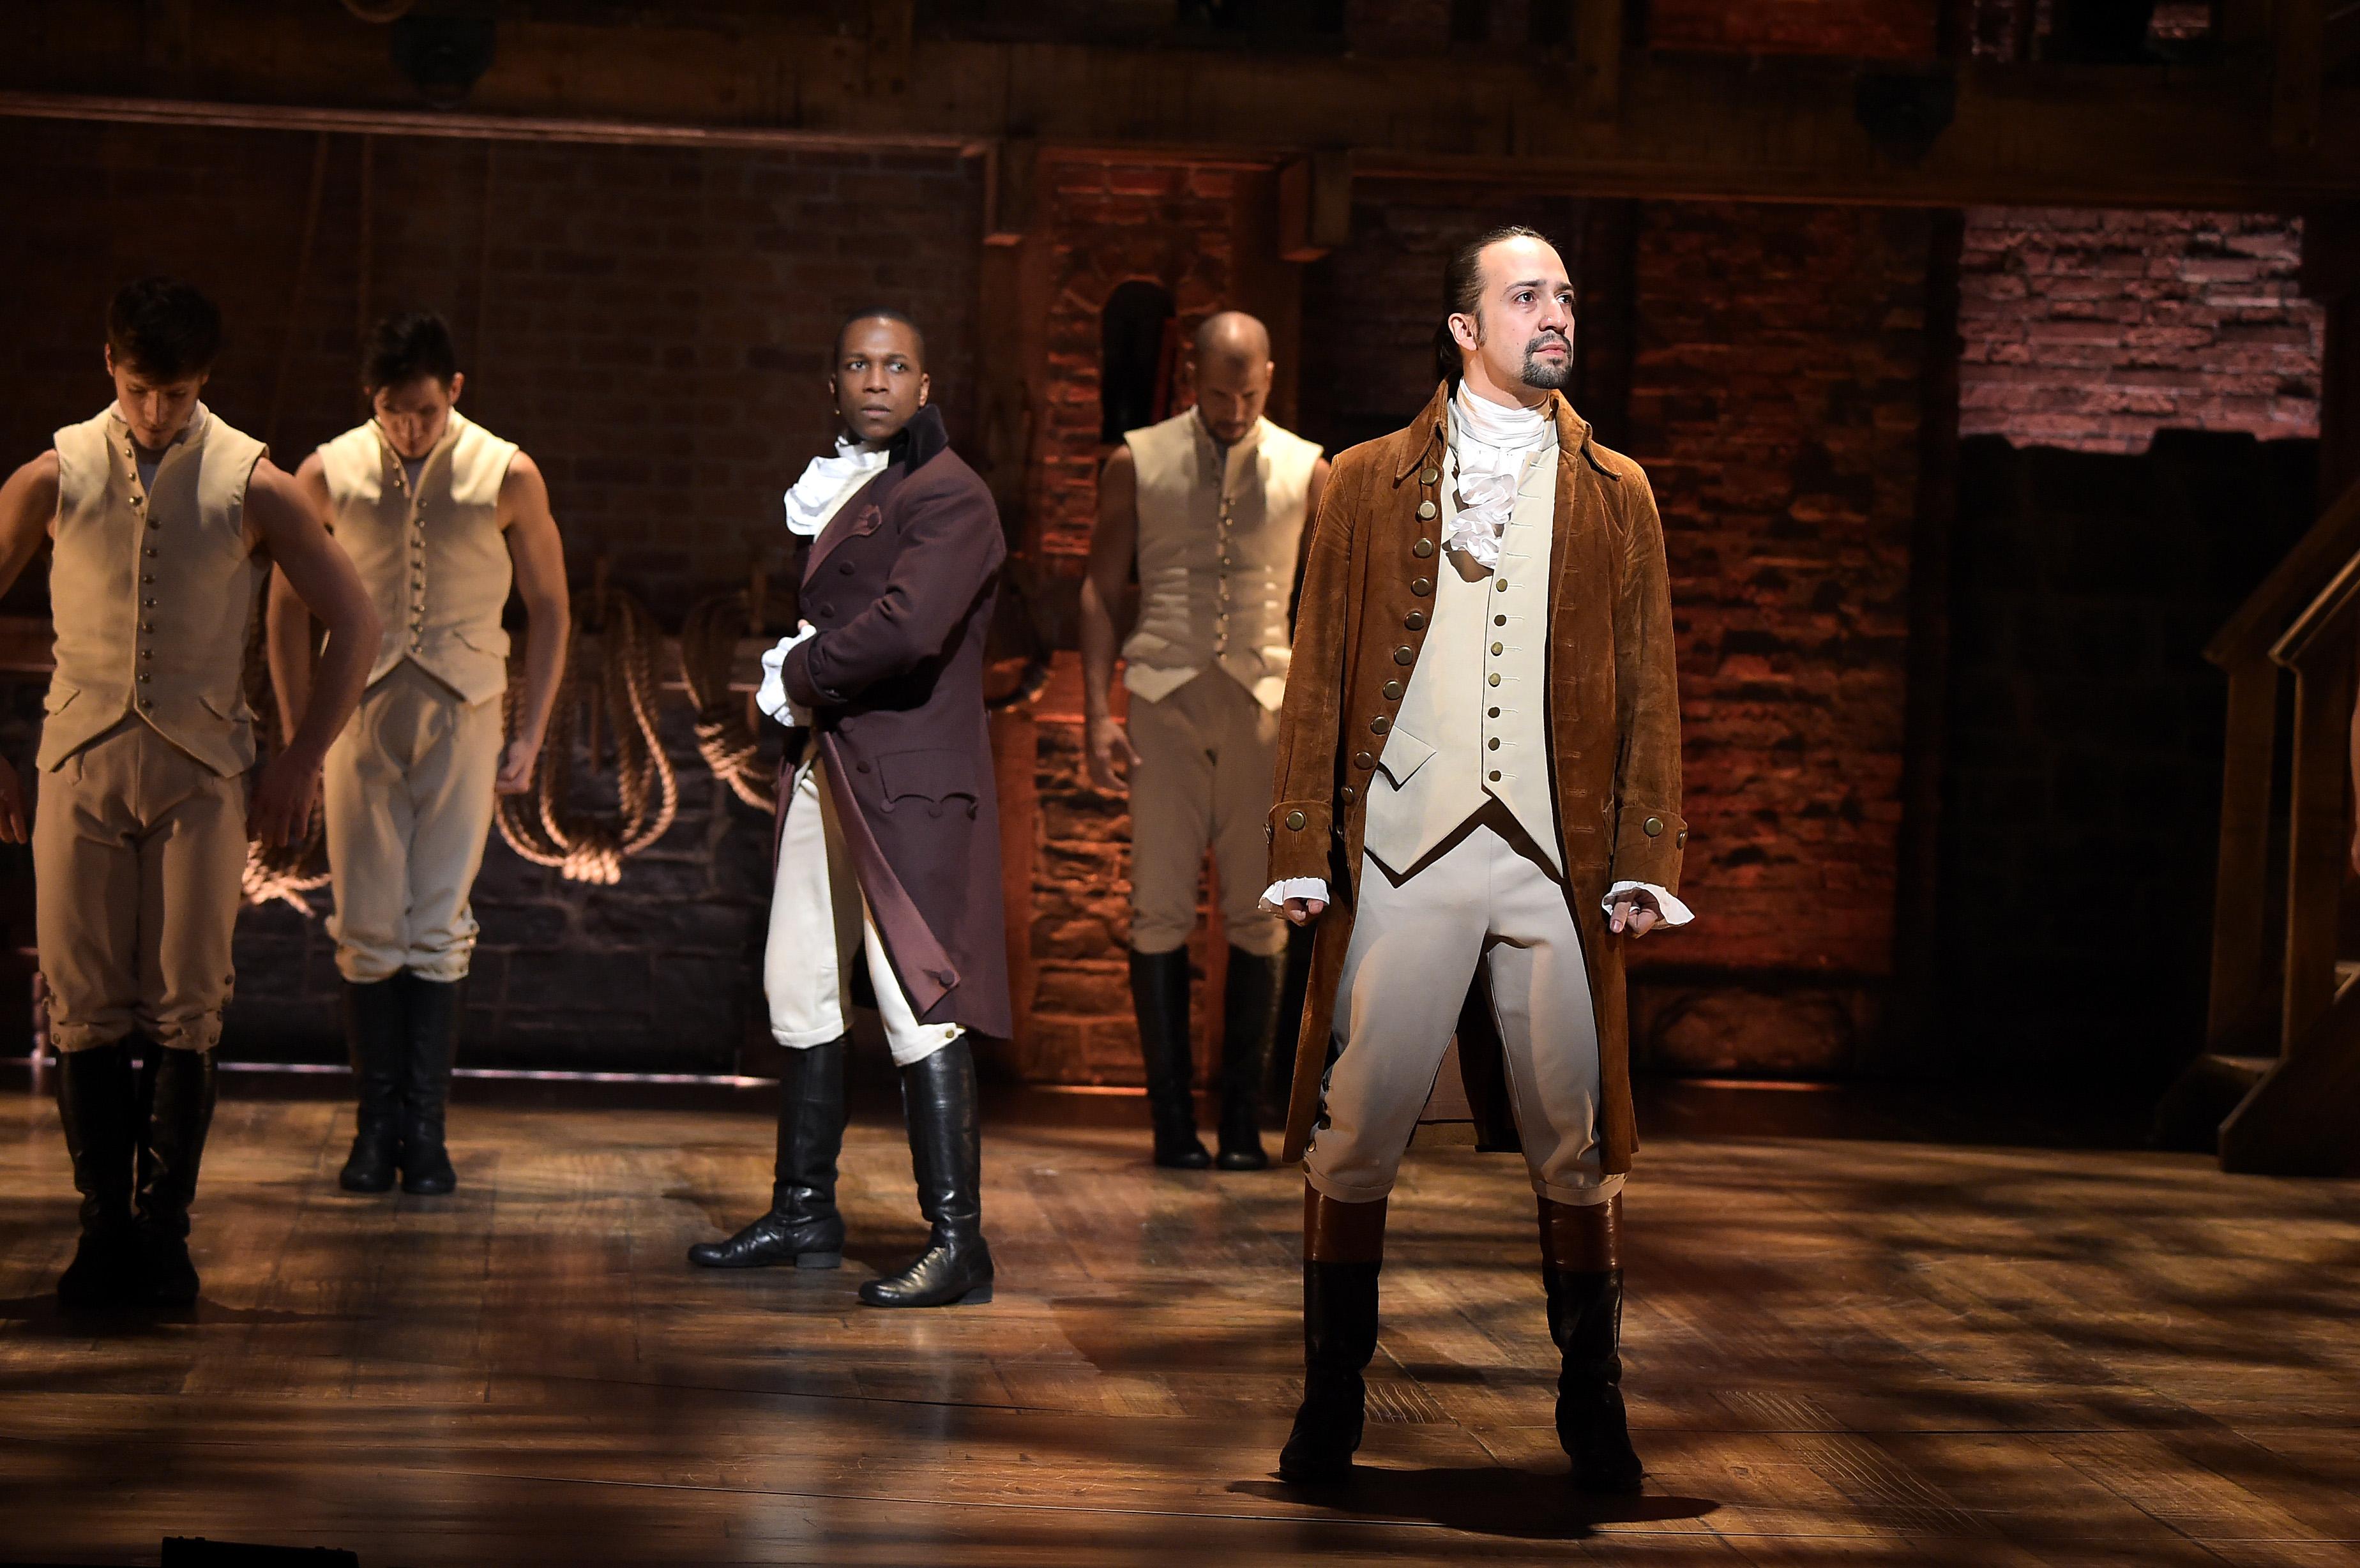 Leslie Odom, Jr. as Aaron Burr and Lin-Manuel Miranda as Alexander Hamilton